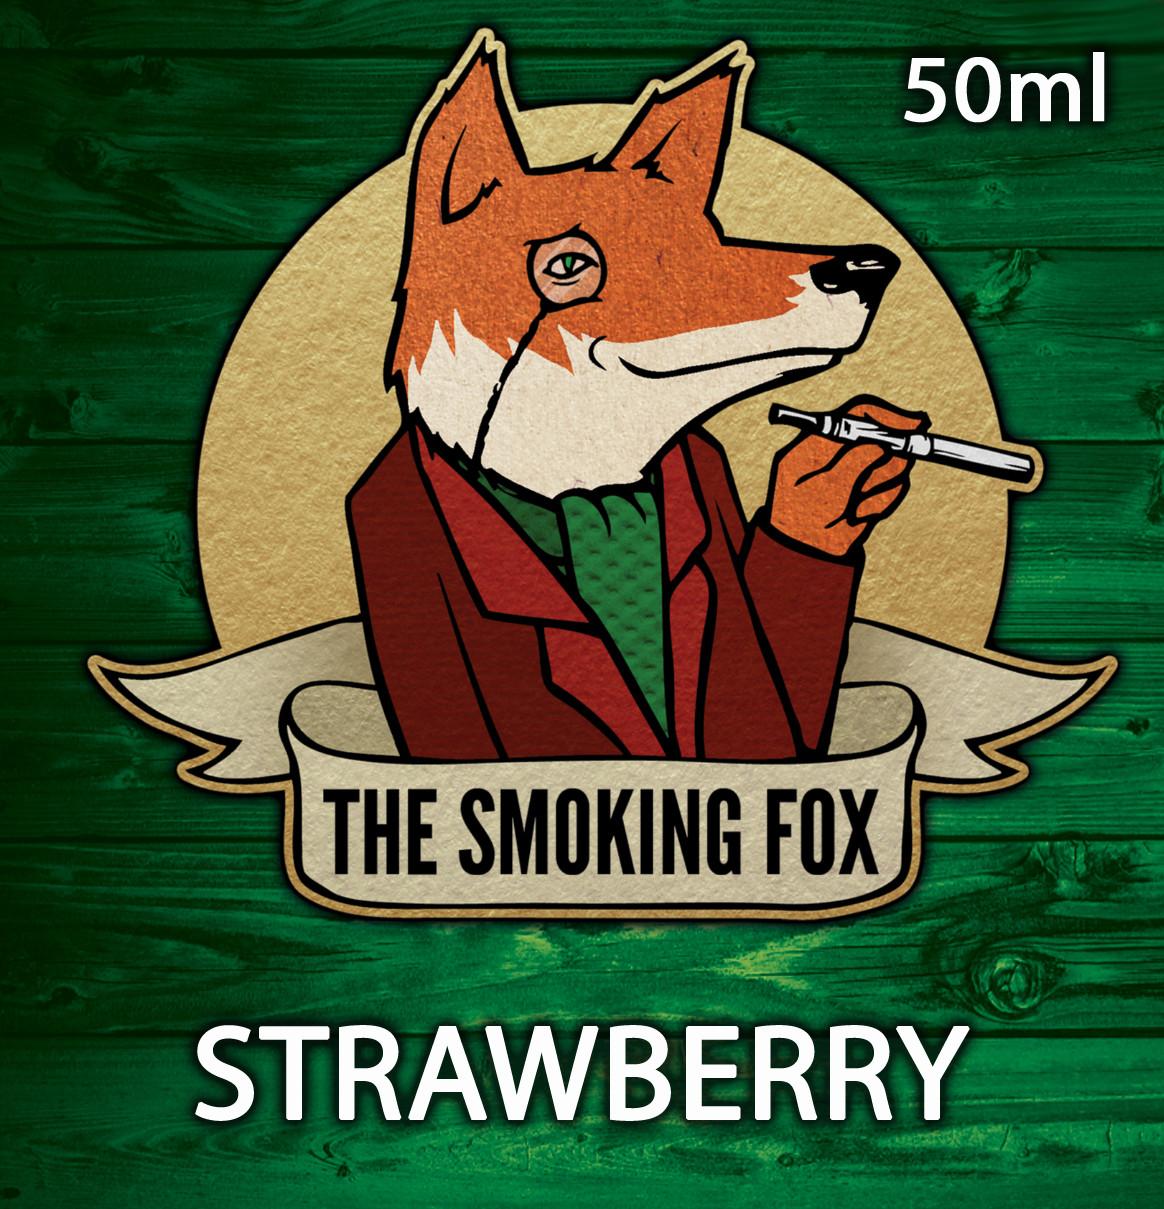 THE SMOKING FOX 50ML SHORTFILL - STRAWBERRY